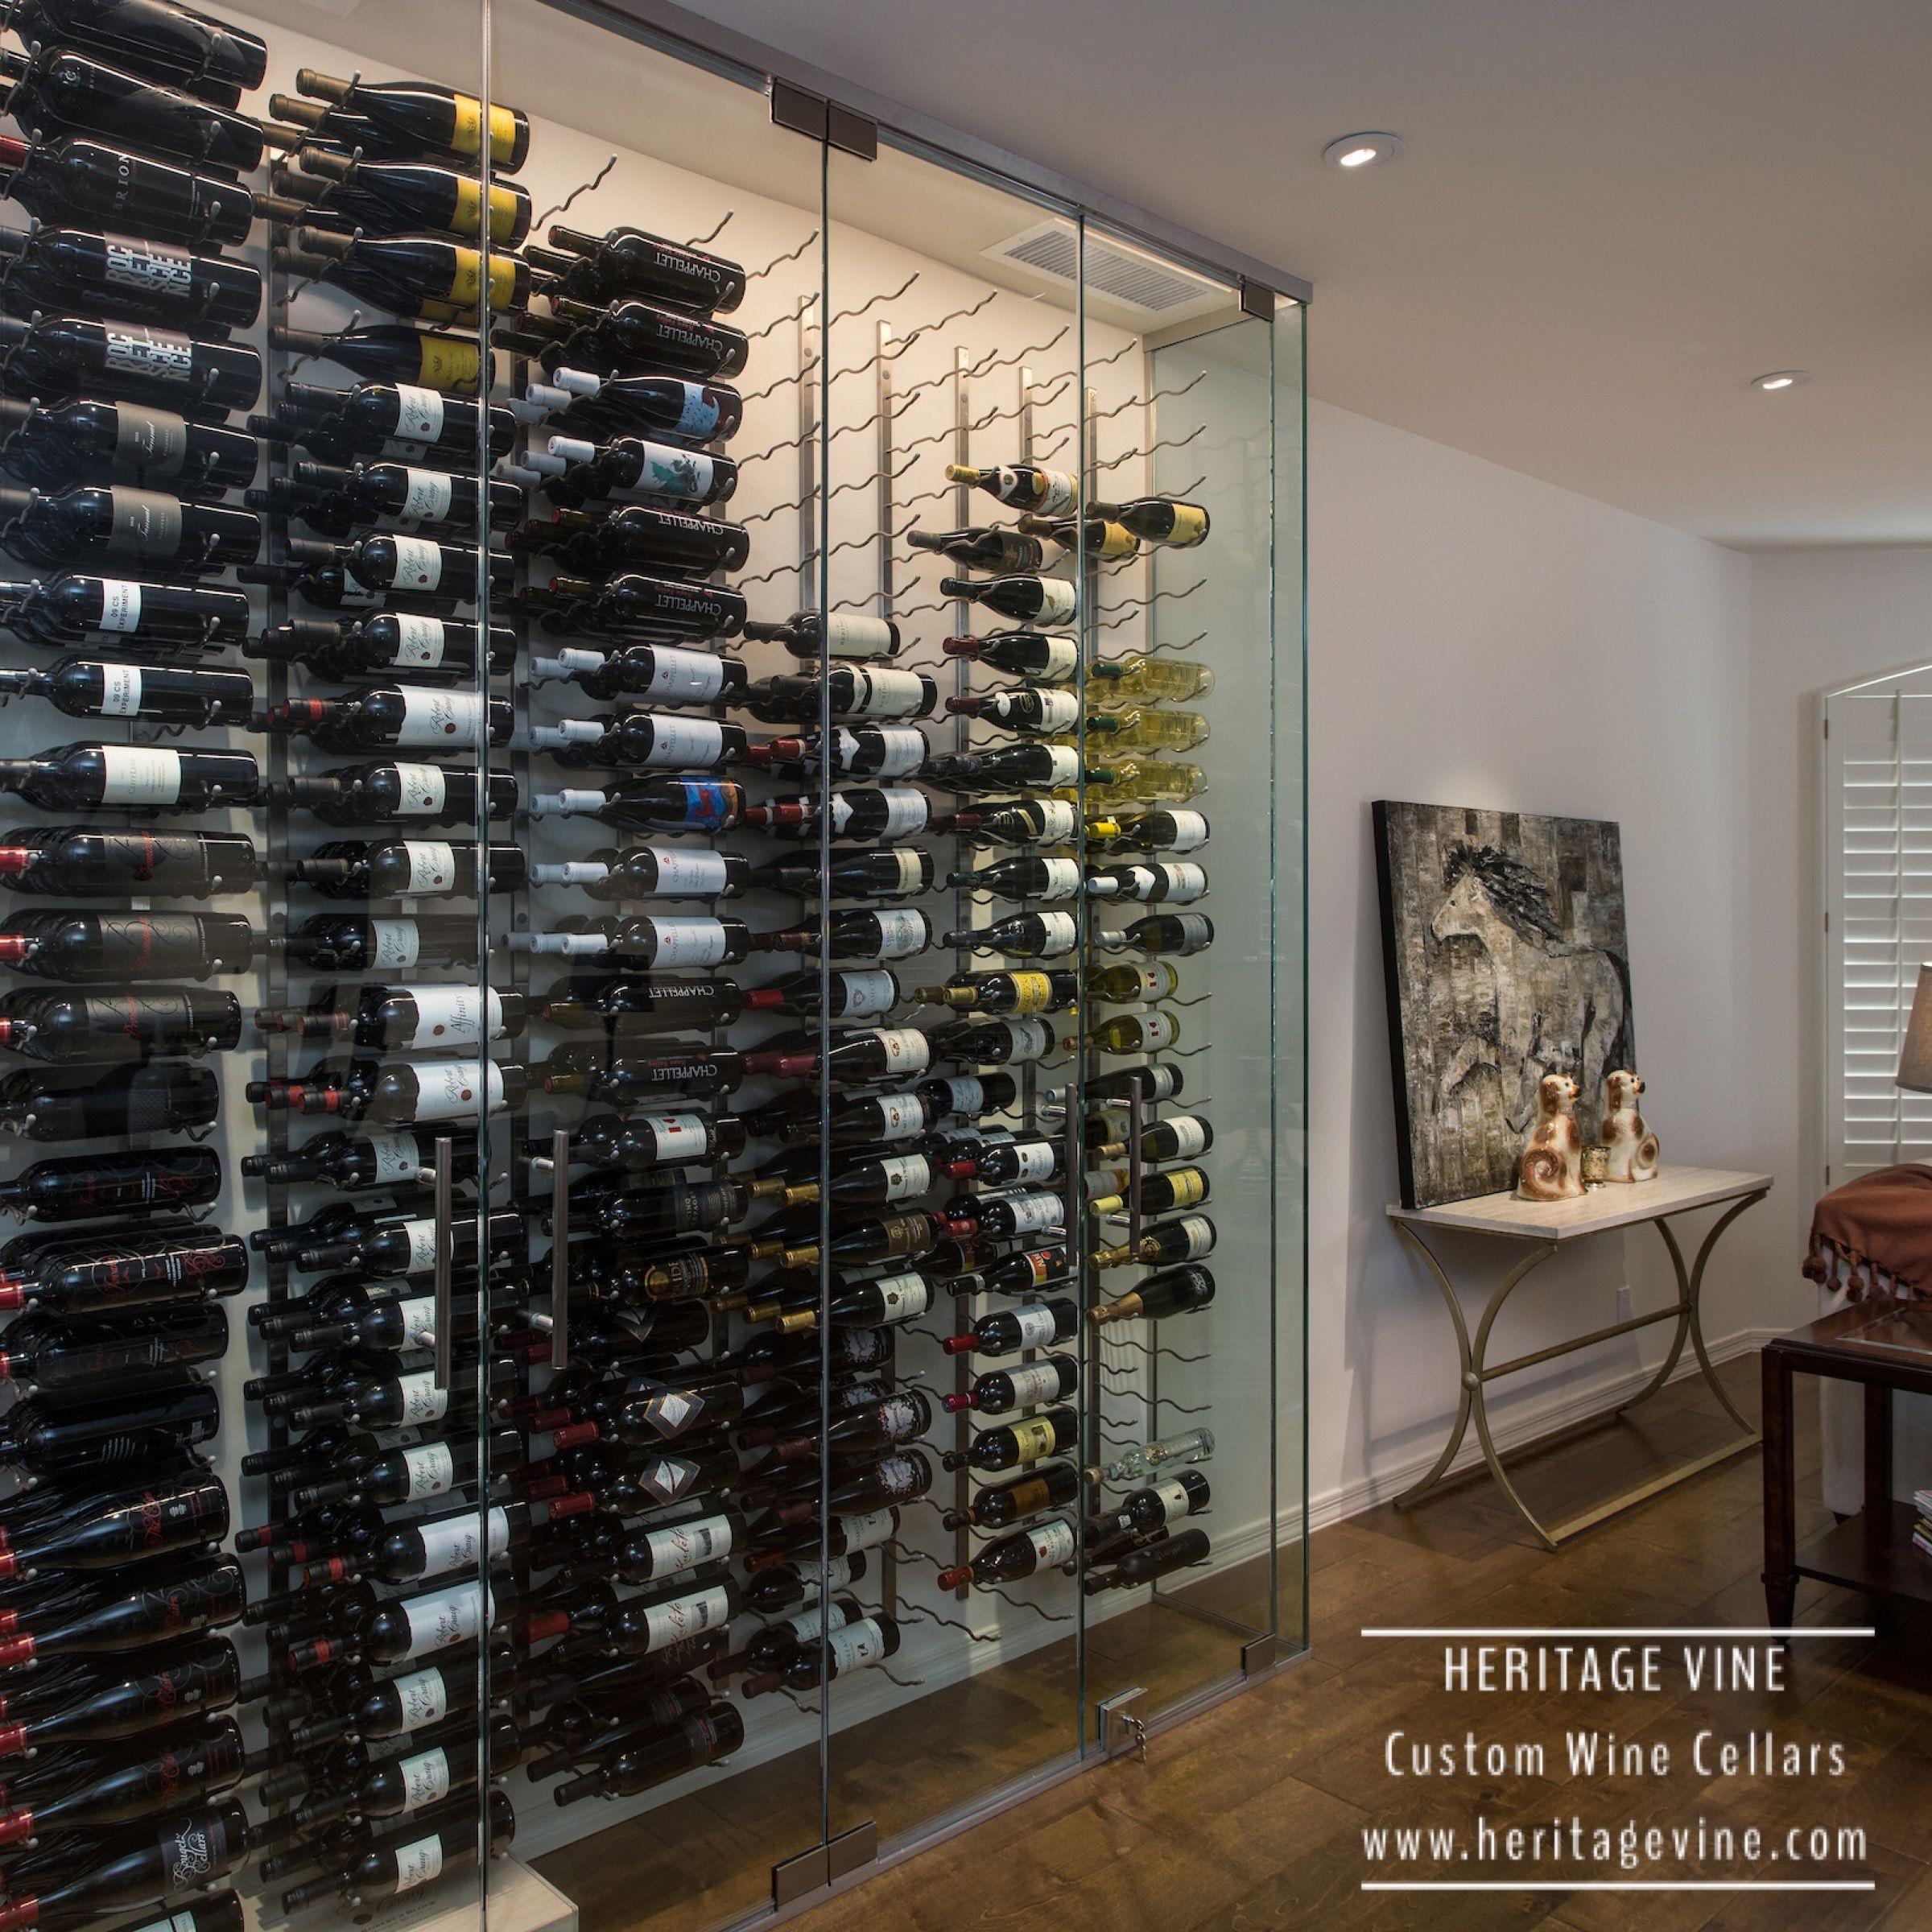 Custom Wine Cellars Cellar Design Custom Wine Cellars Wine